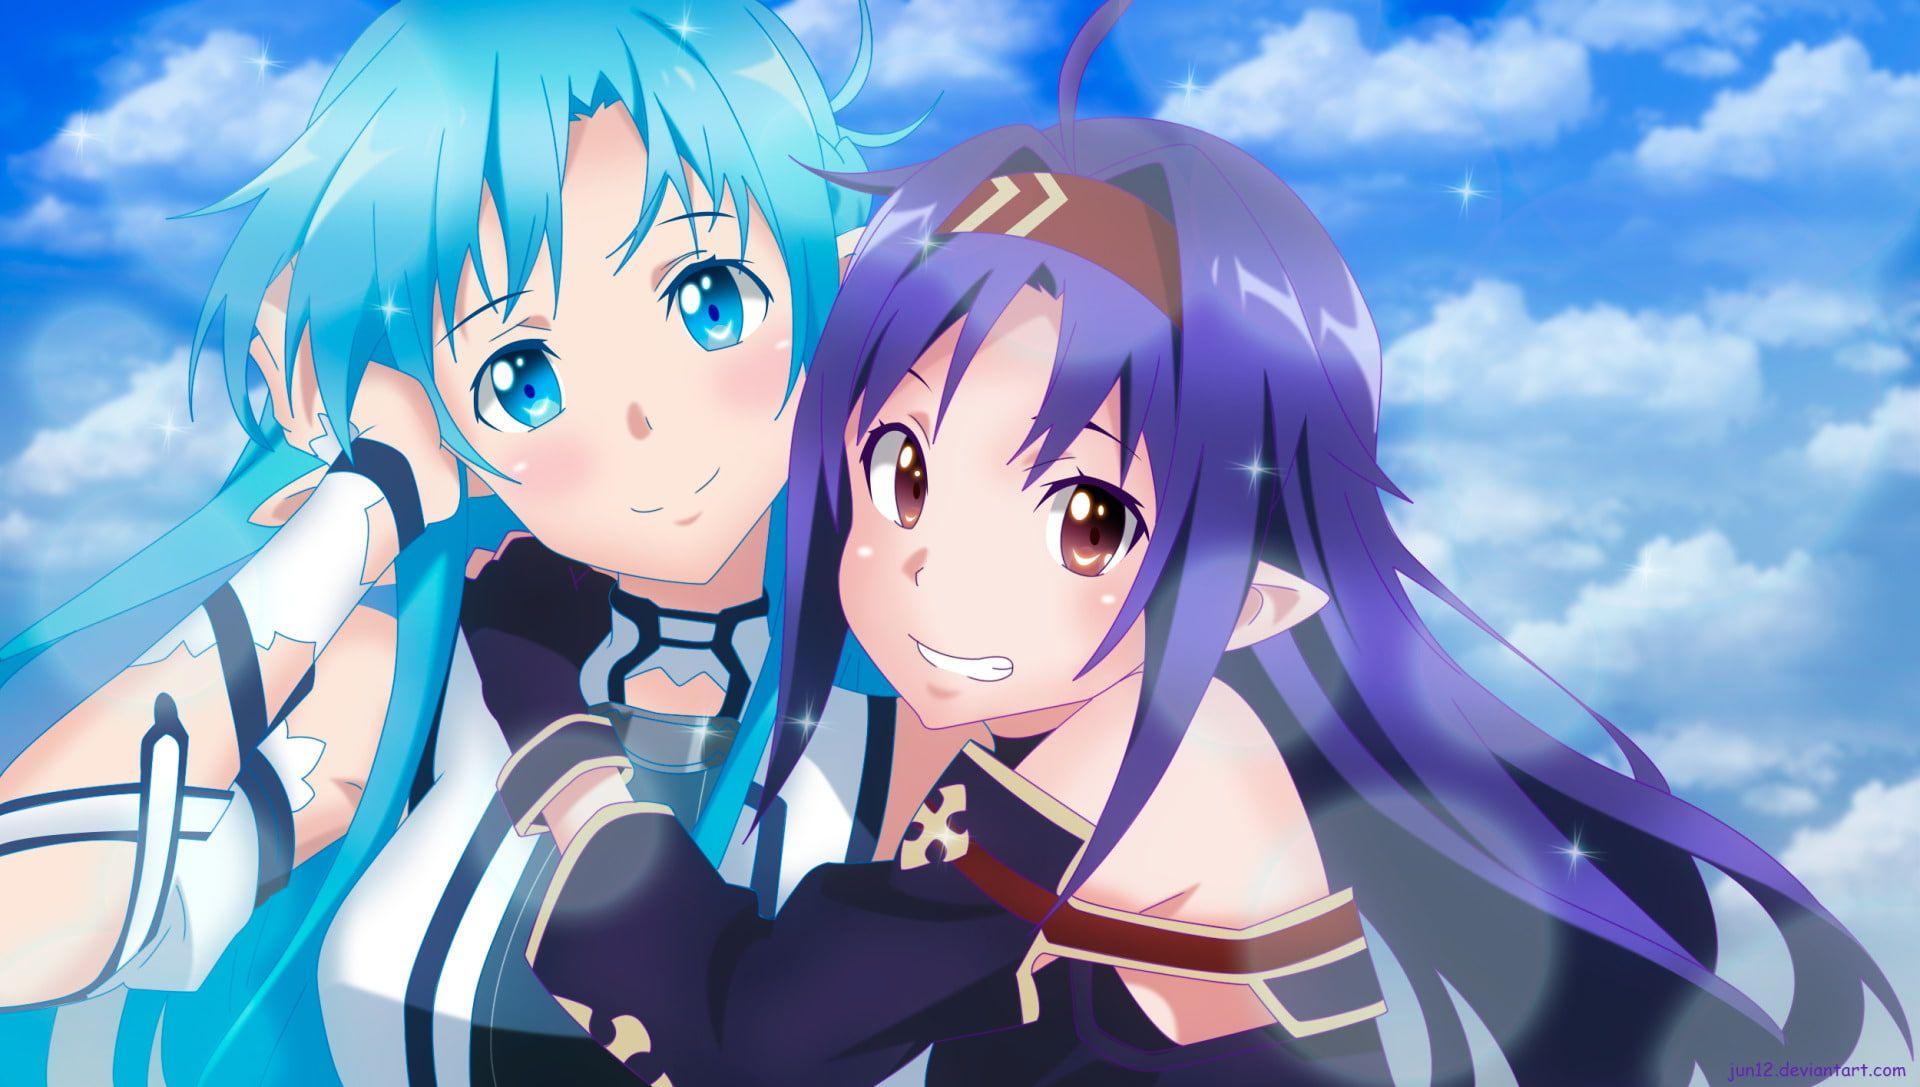 Sword Art Online Sword Art Online II Asuna Yuuki Yuuki